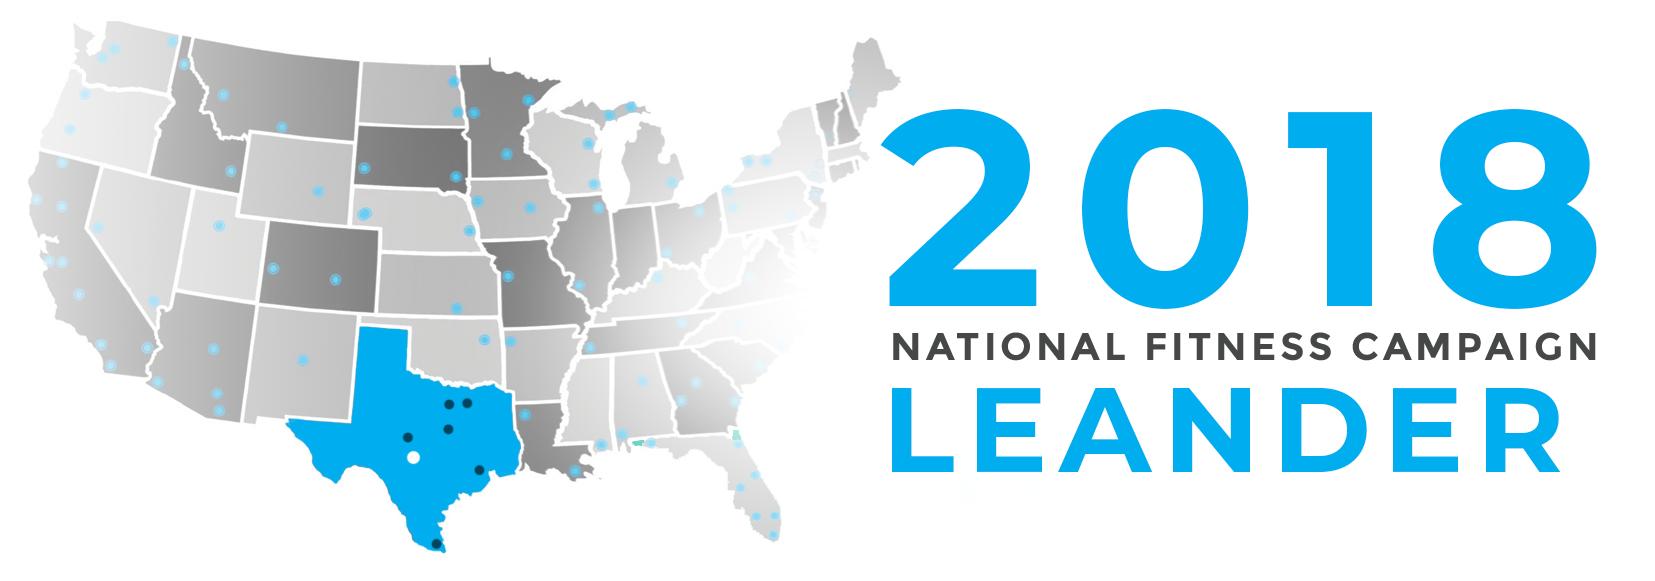 2018 Campaign Logo Leander.png